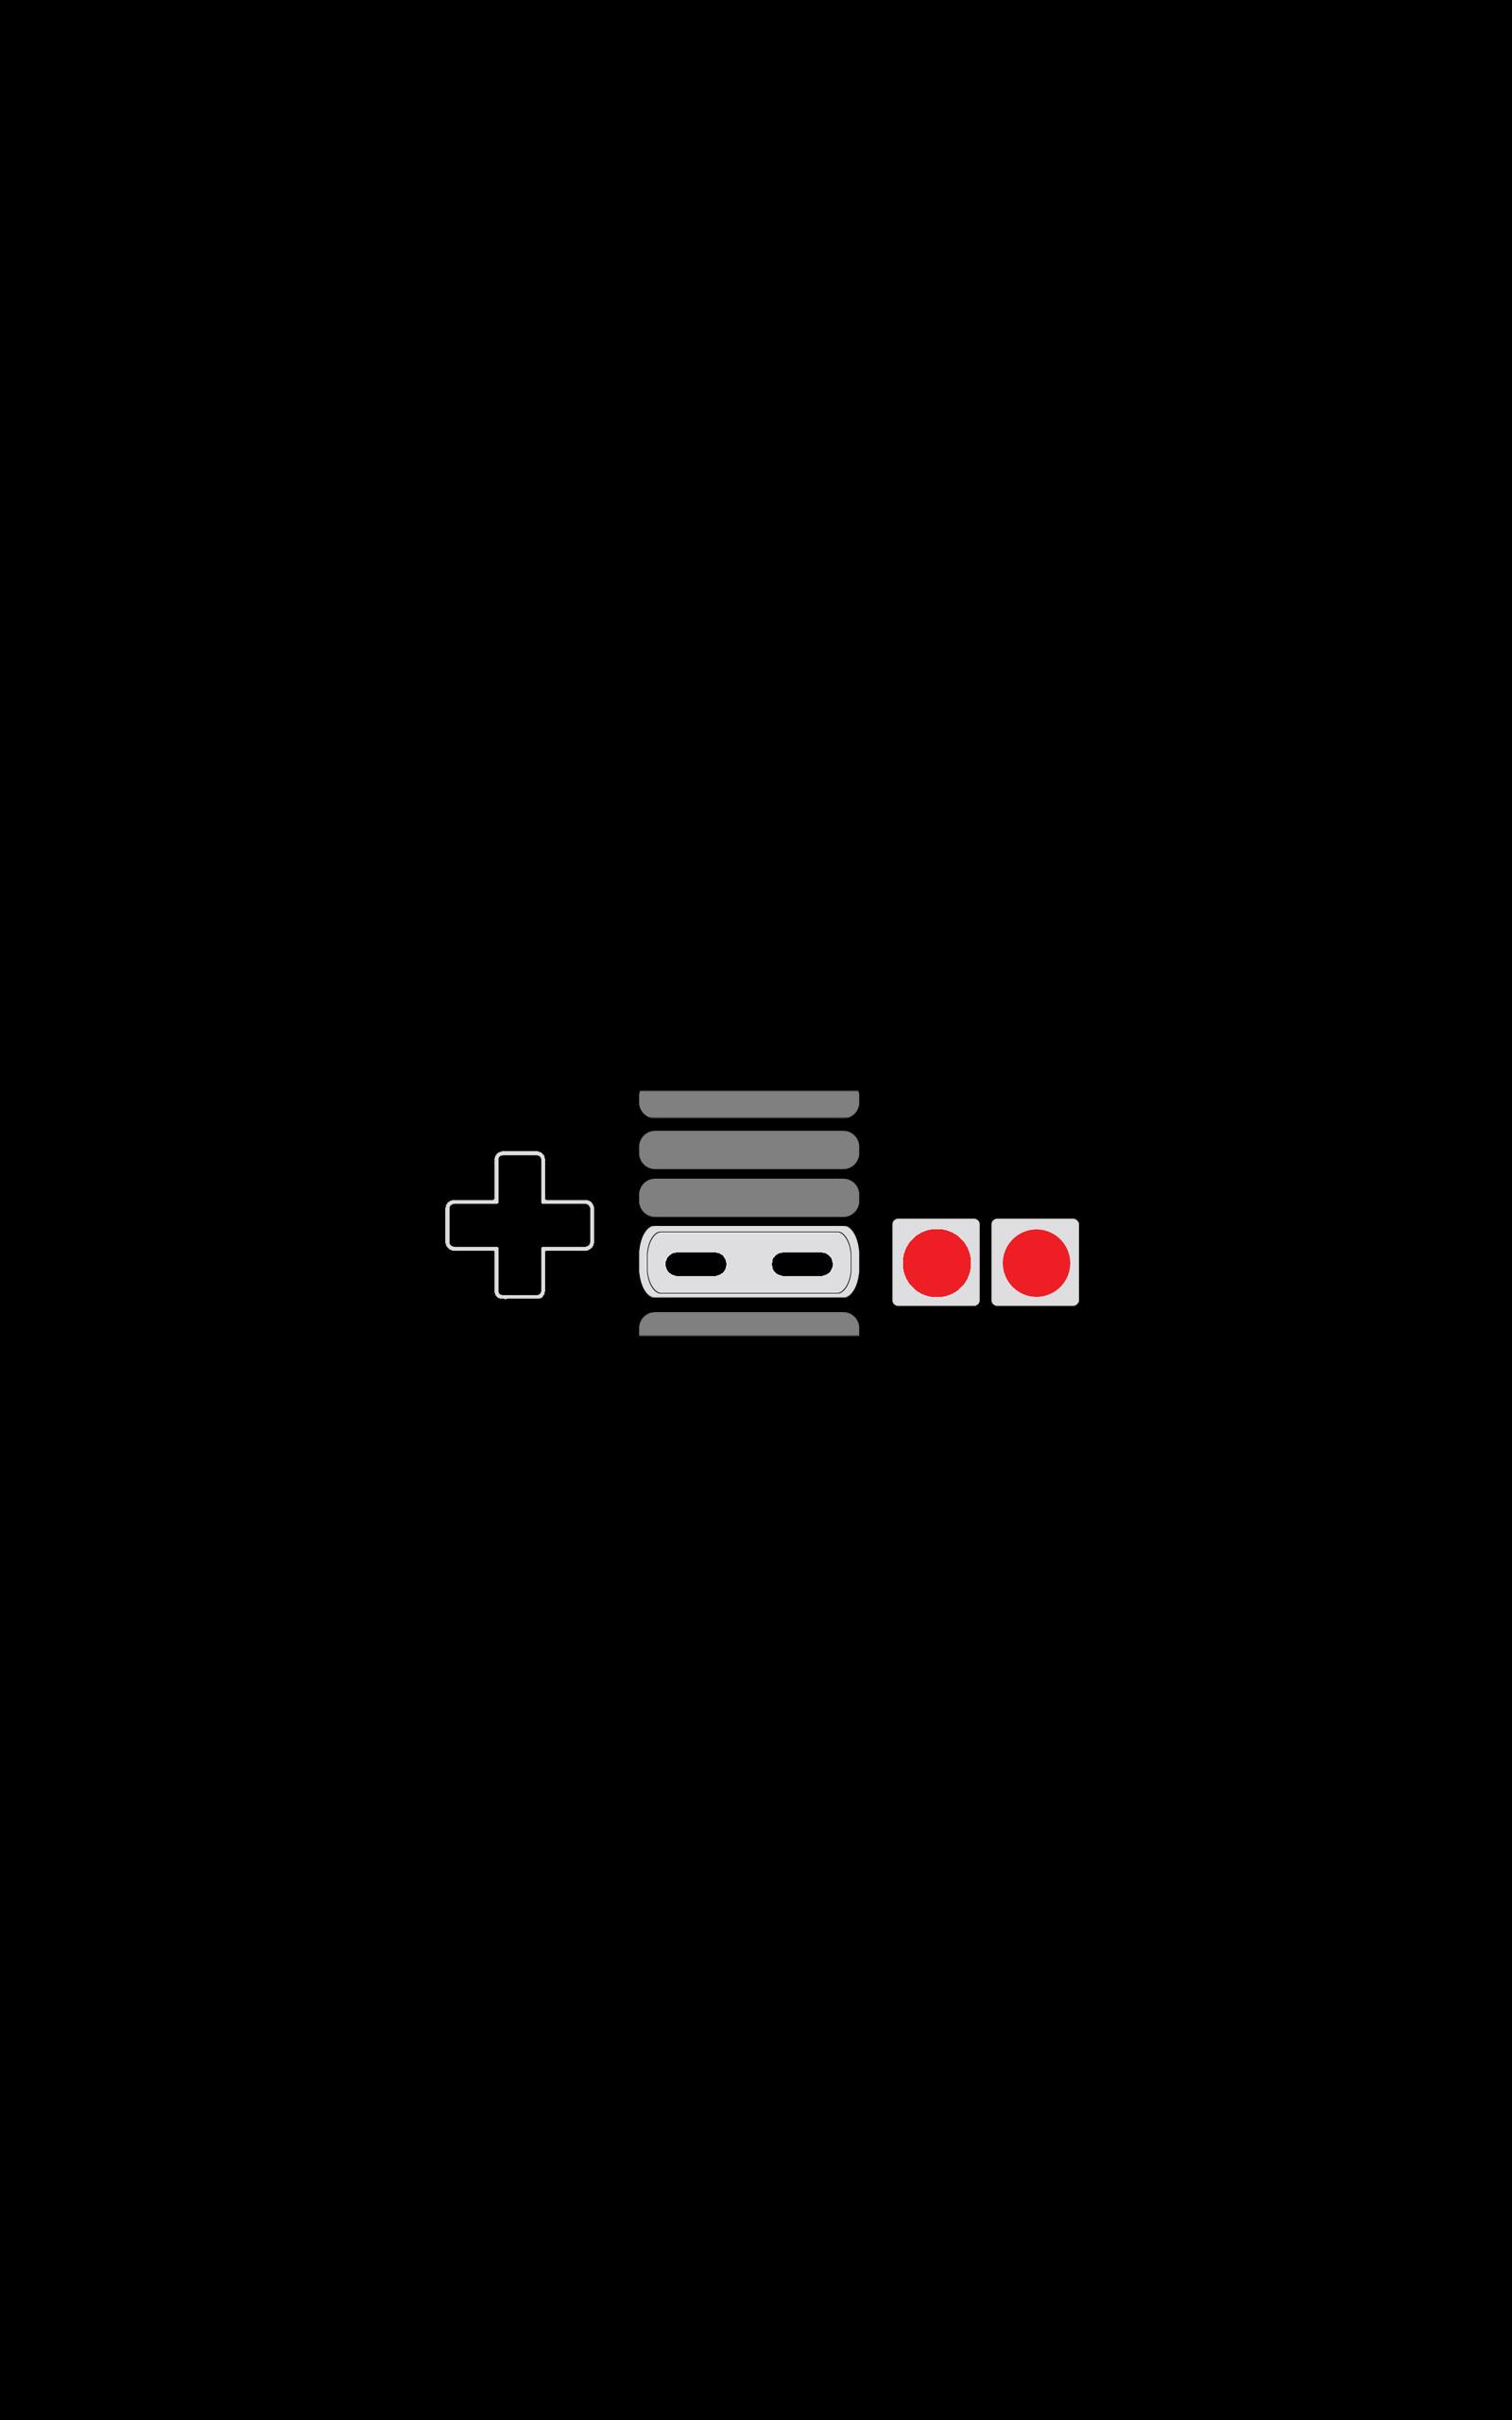 Minimalist Gaming Wallpaper 83 images